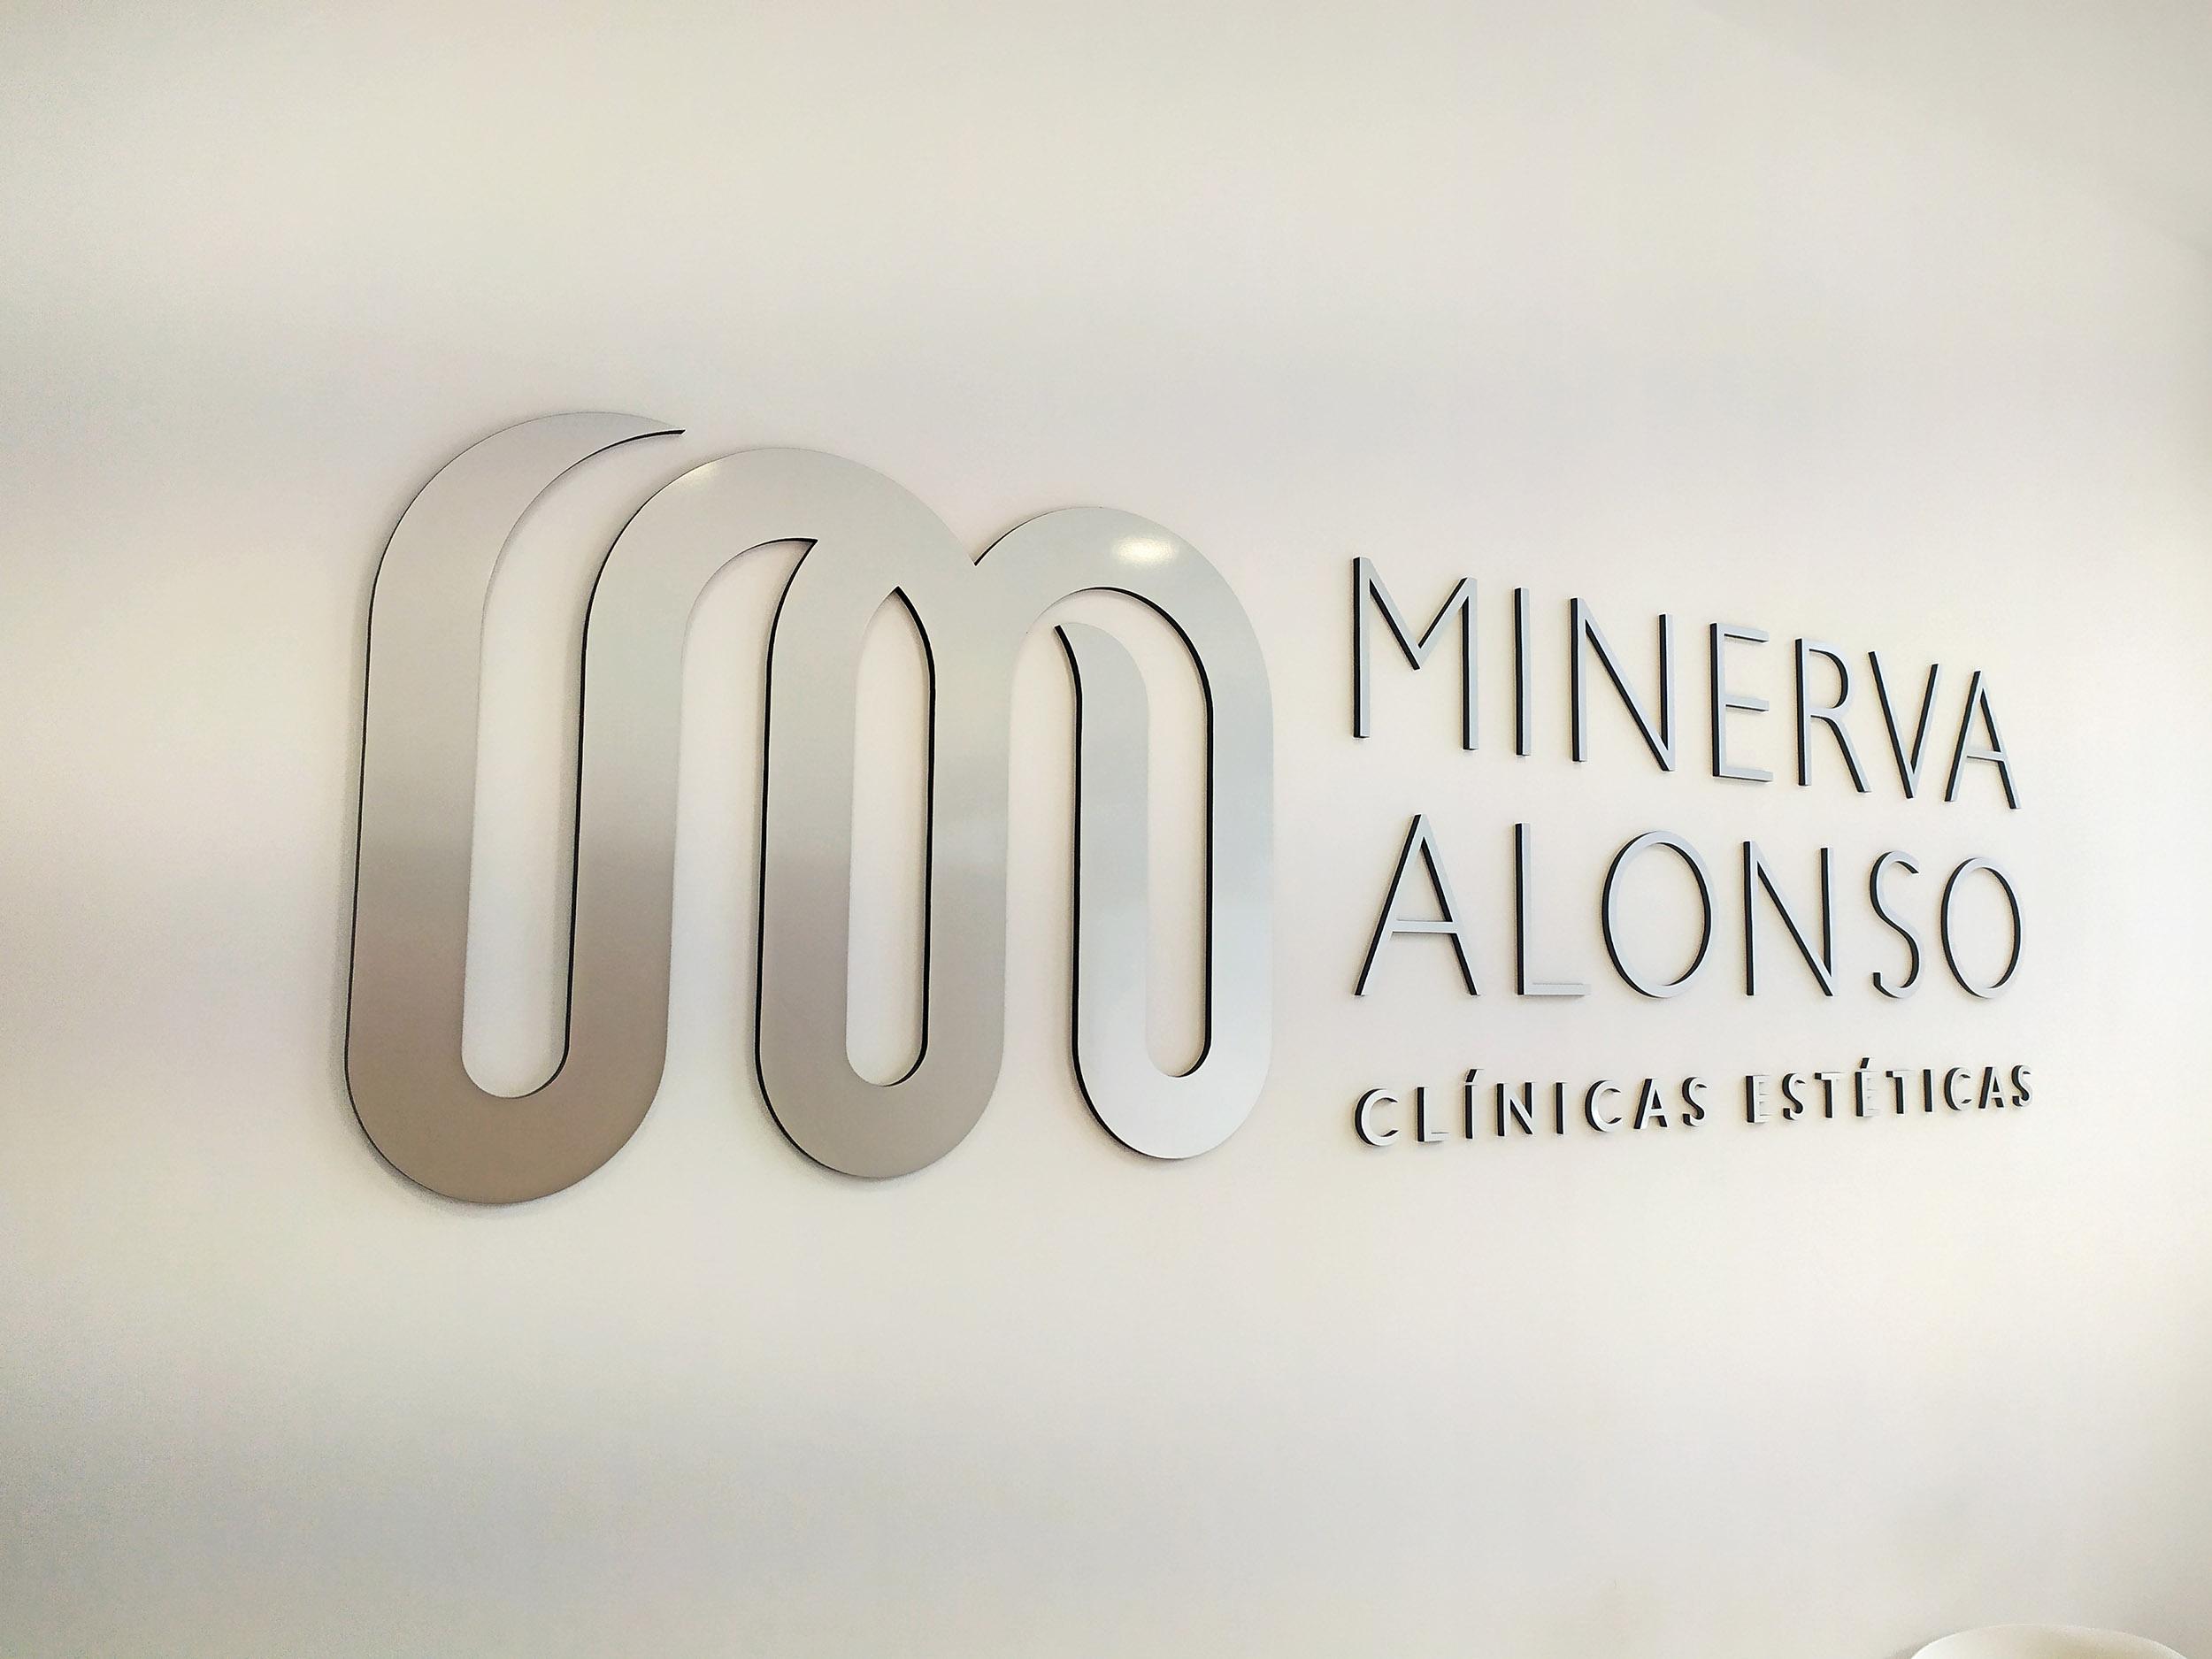 Minerva alonso clínicas estéticas, medicina estética - CLÍNICA ESTÉTICA